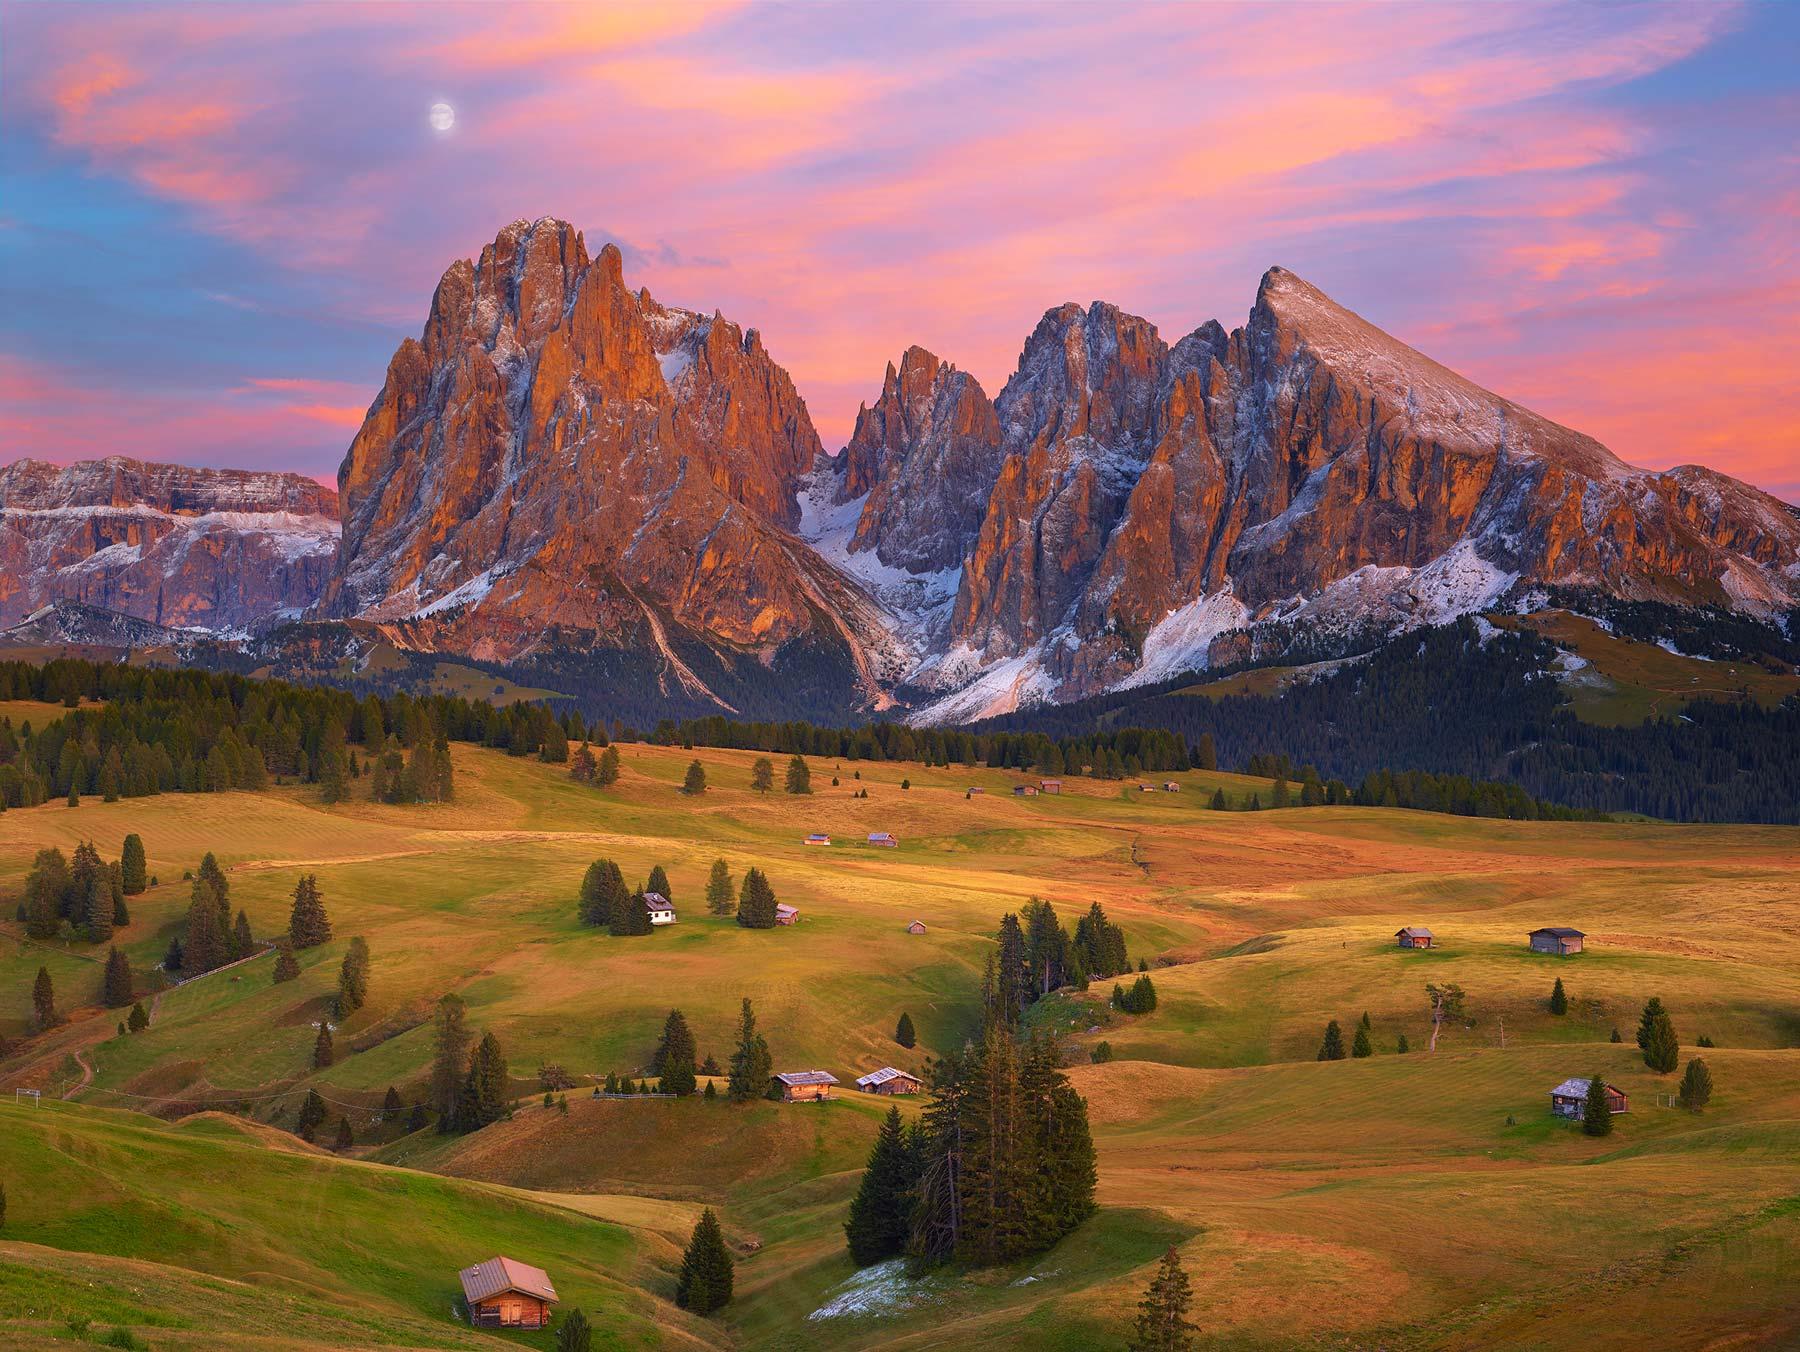 A radiant sun set over Alpe di Siusi, The Dolomites, Italy.